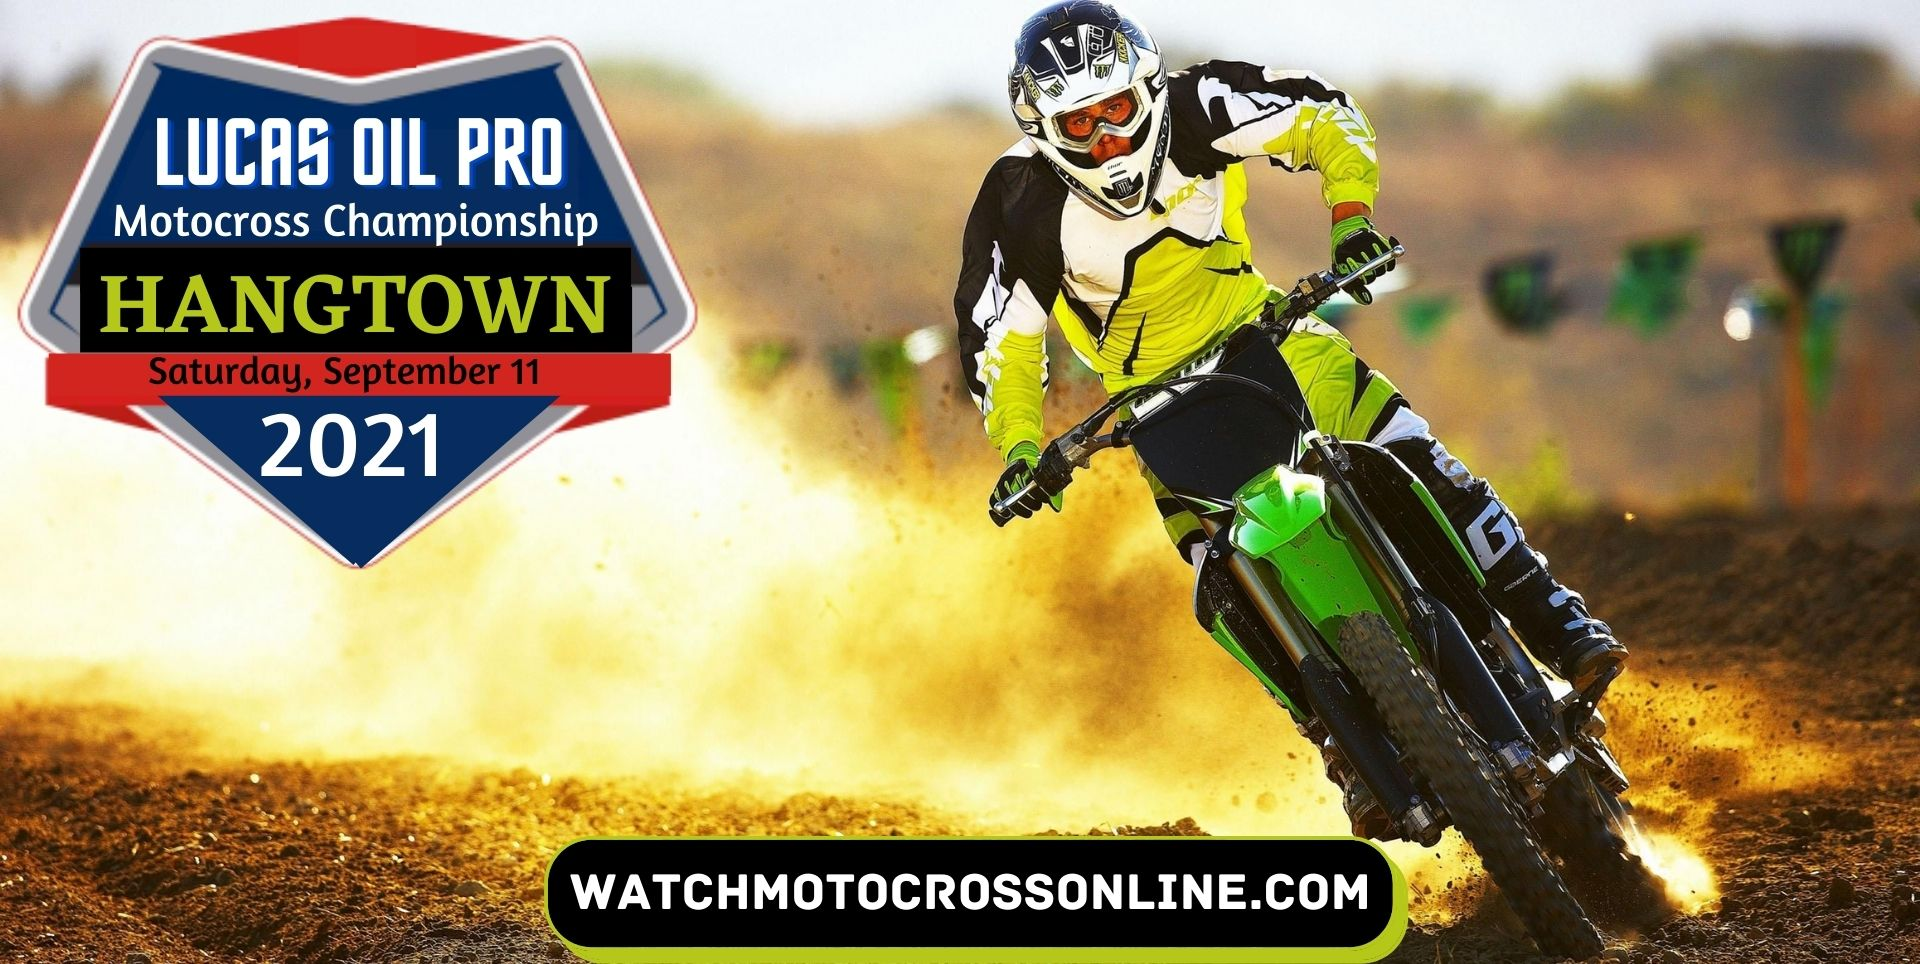 Hangtown Motocross Live Stream 2021